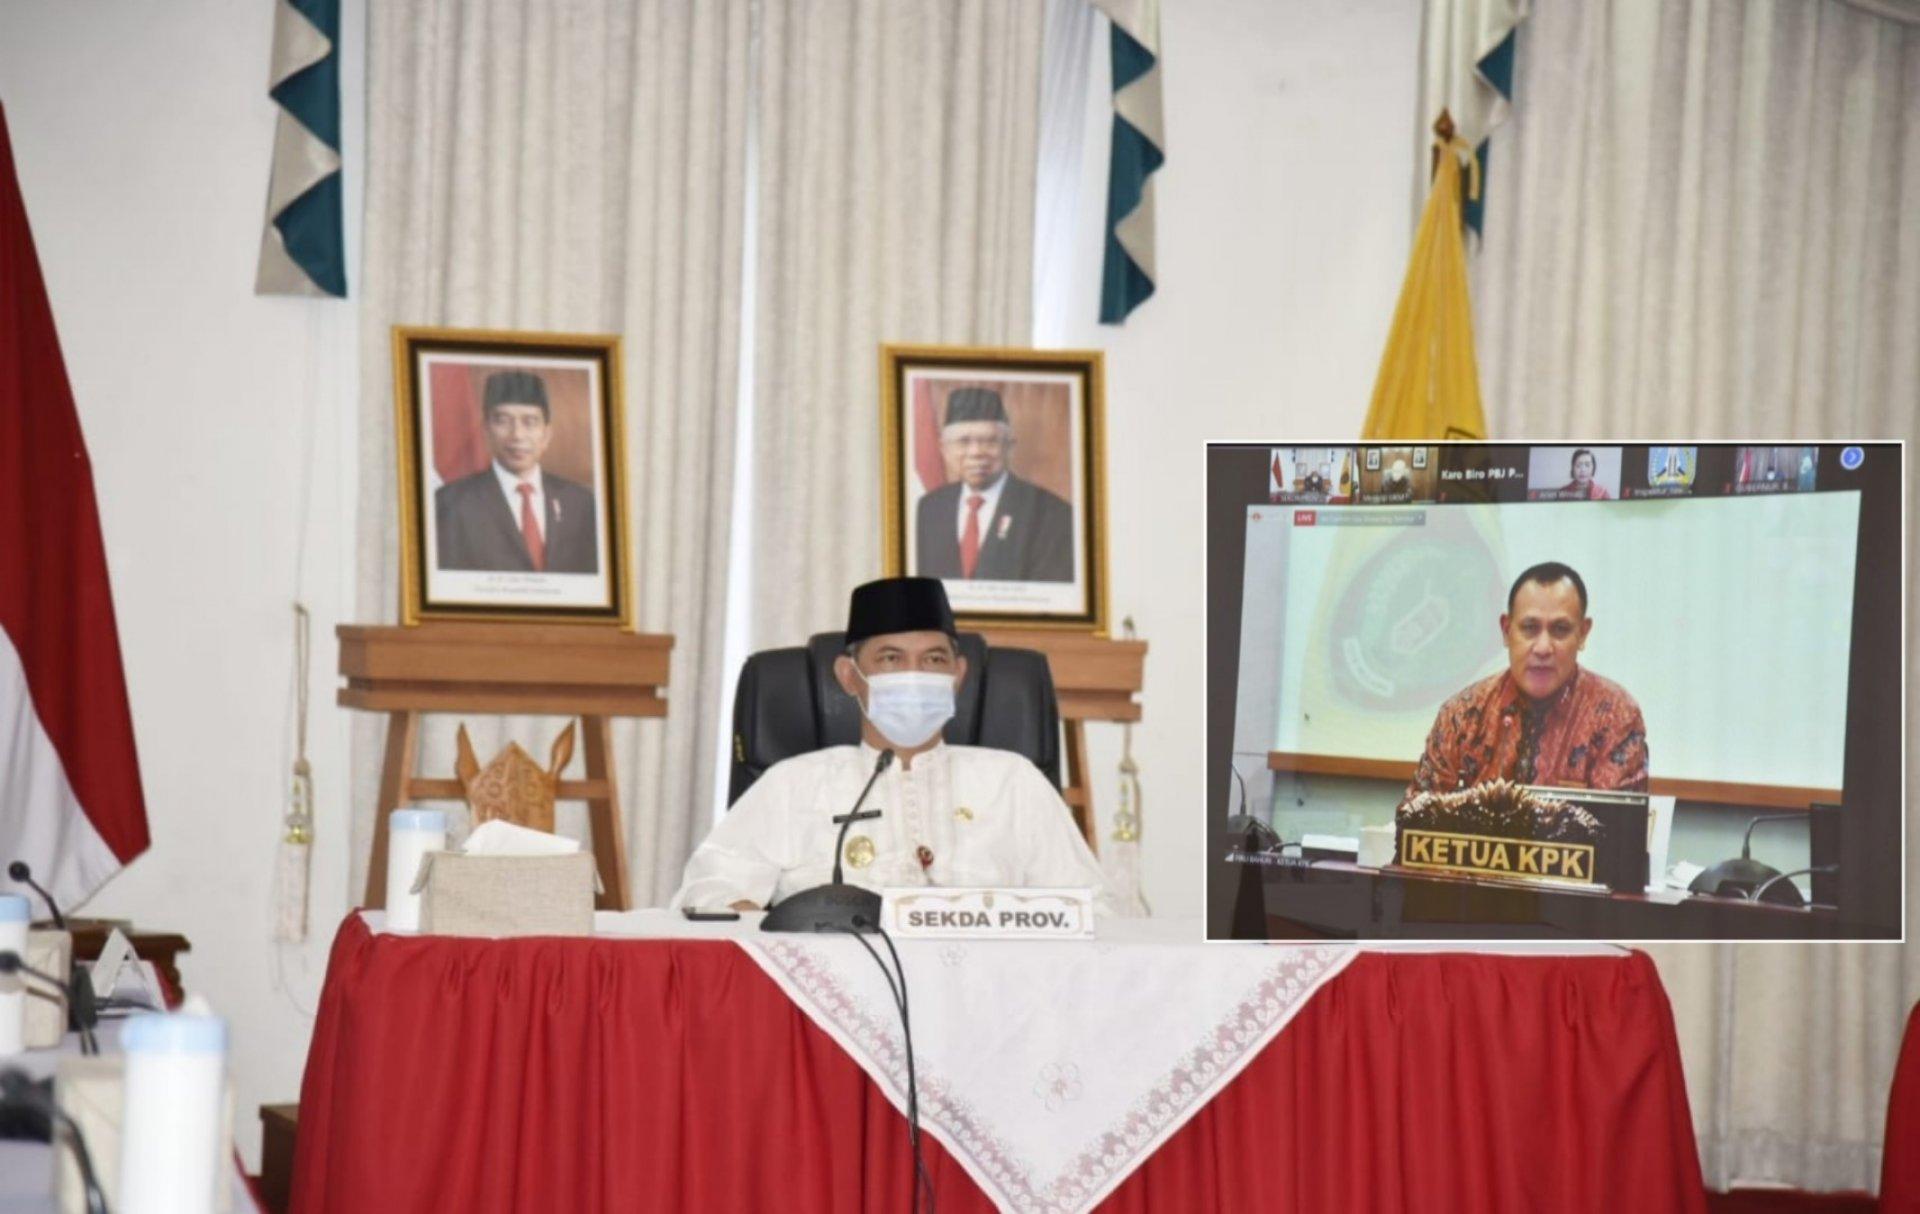 Sekda Kalteng Ikuti Rapat Koordinasi Bela Pengadaan Online Pemerintahan Daerah